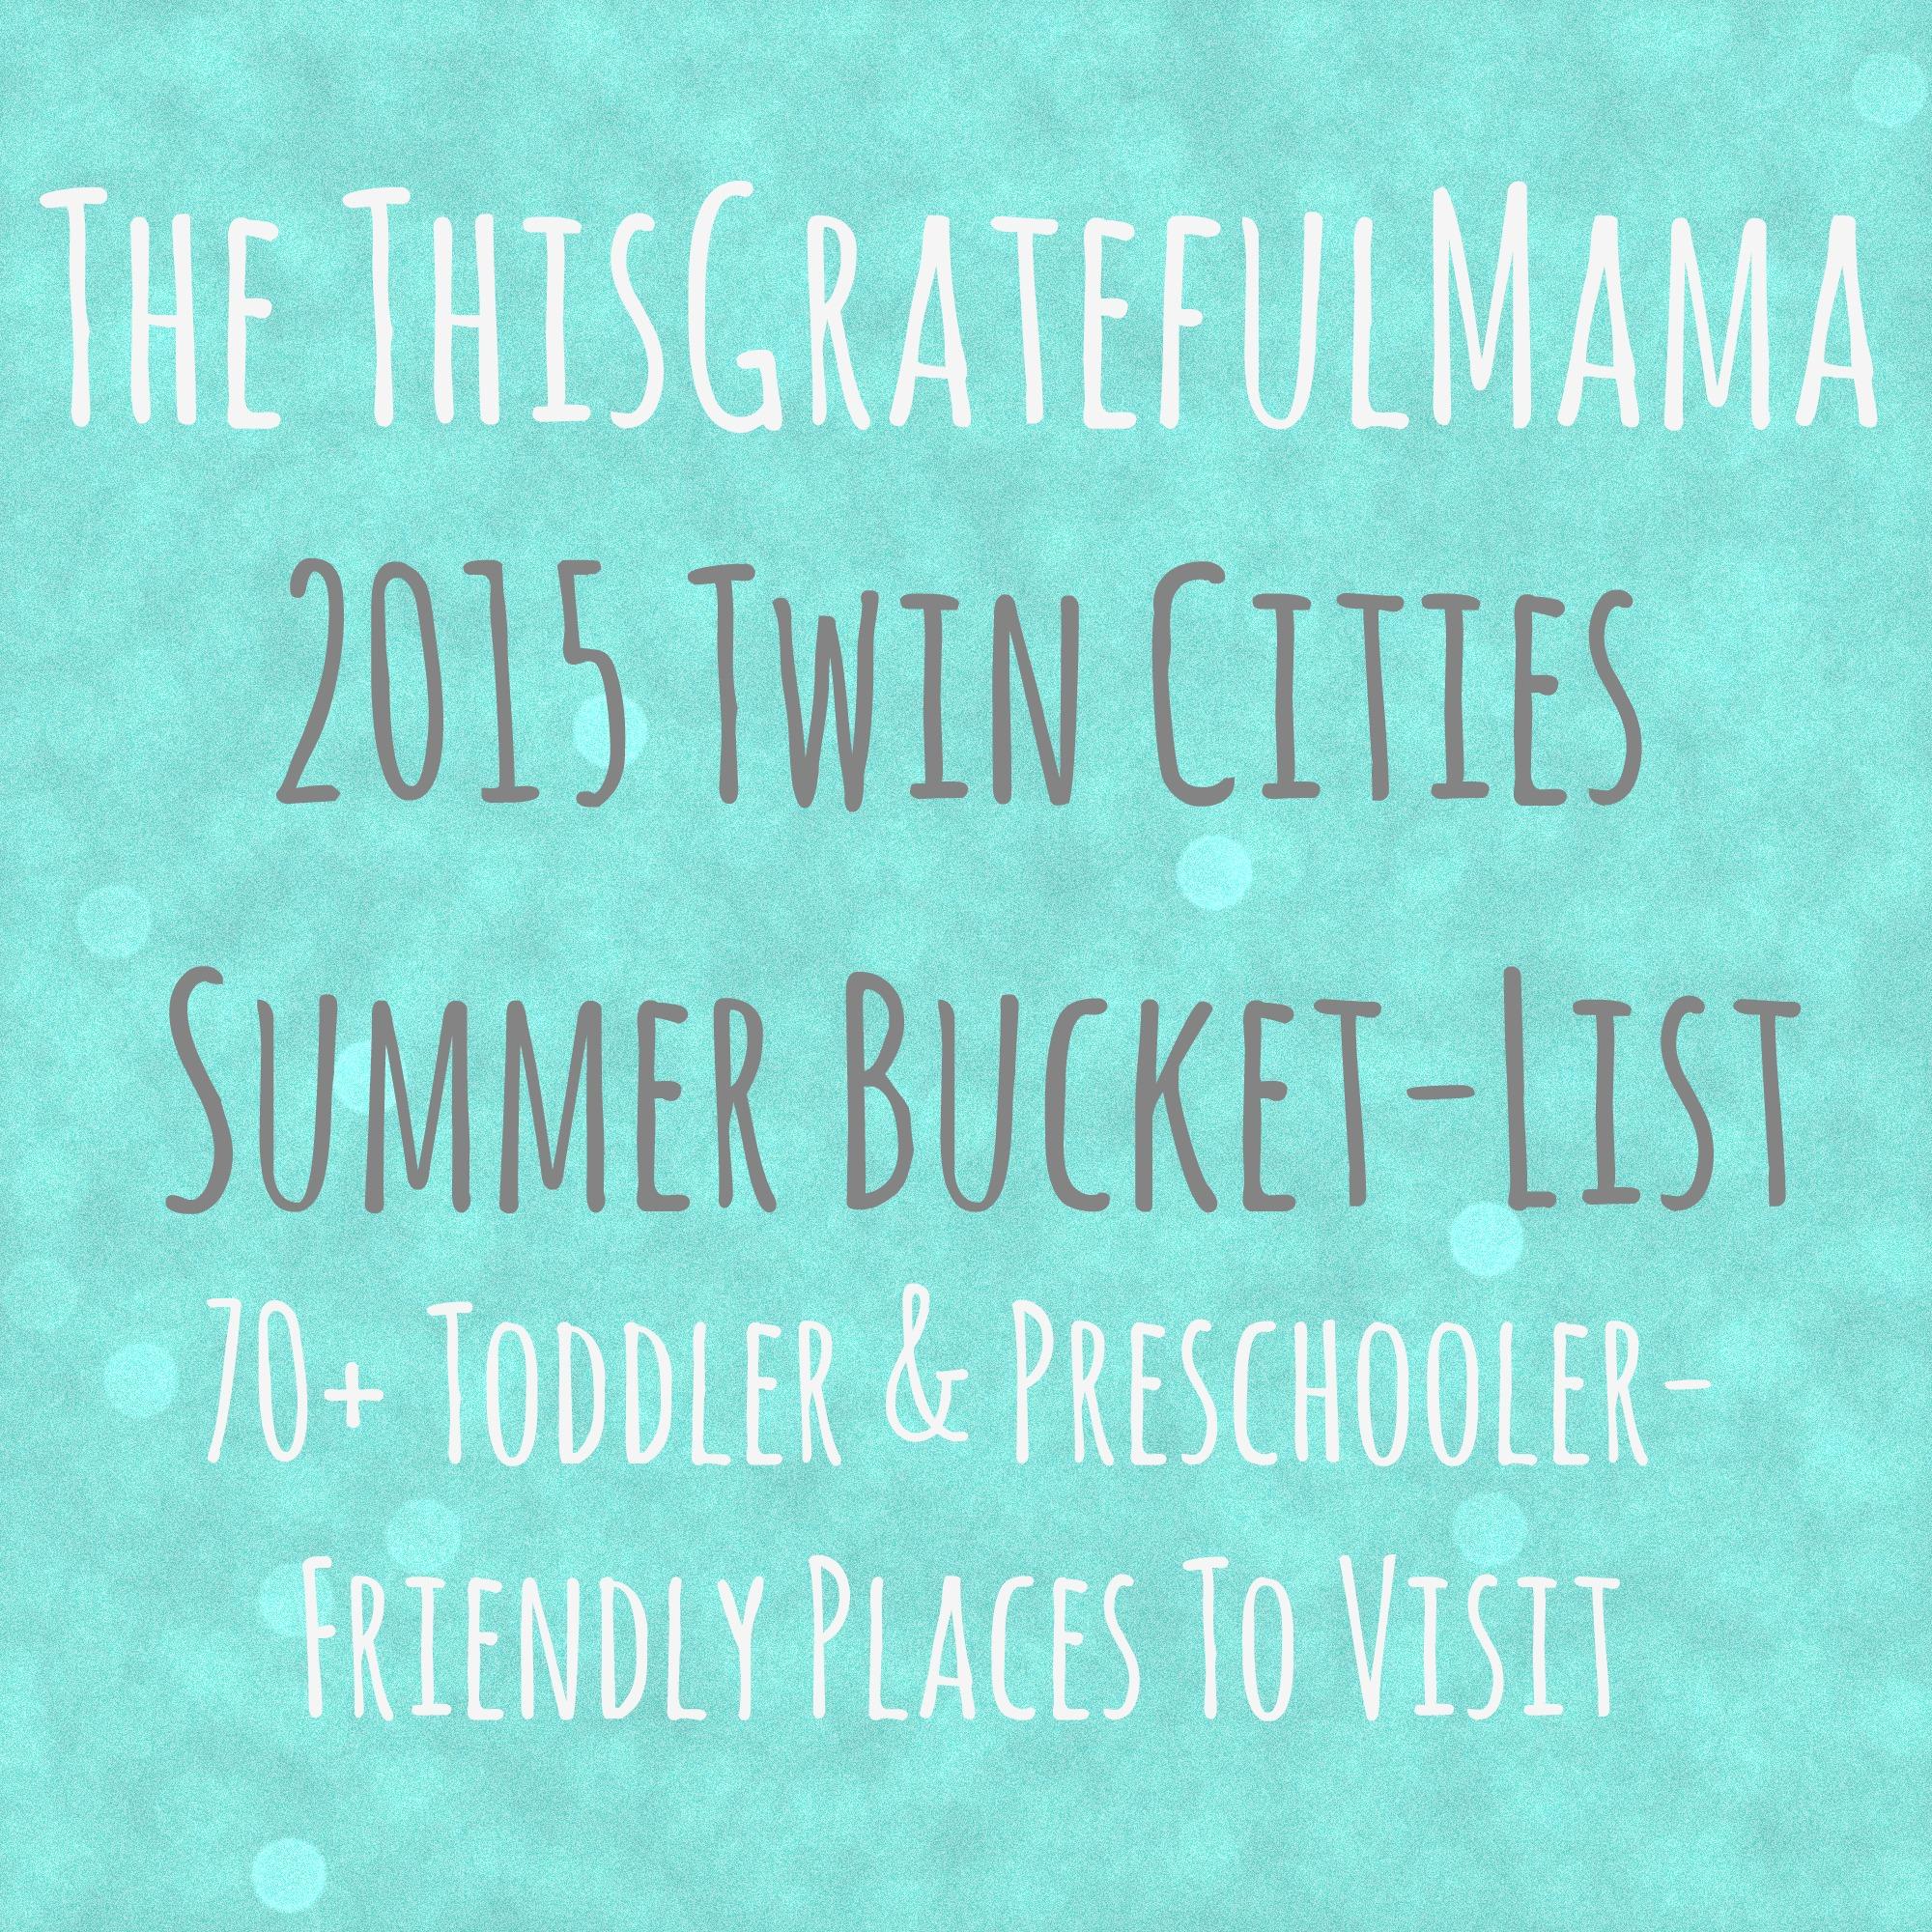 The thisgratefulmama 2015 Twin Cities Summer Bucket-List (70+ ...